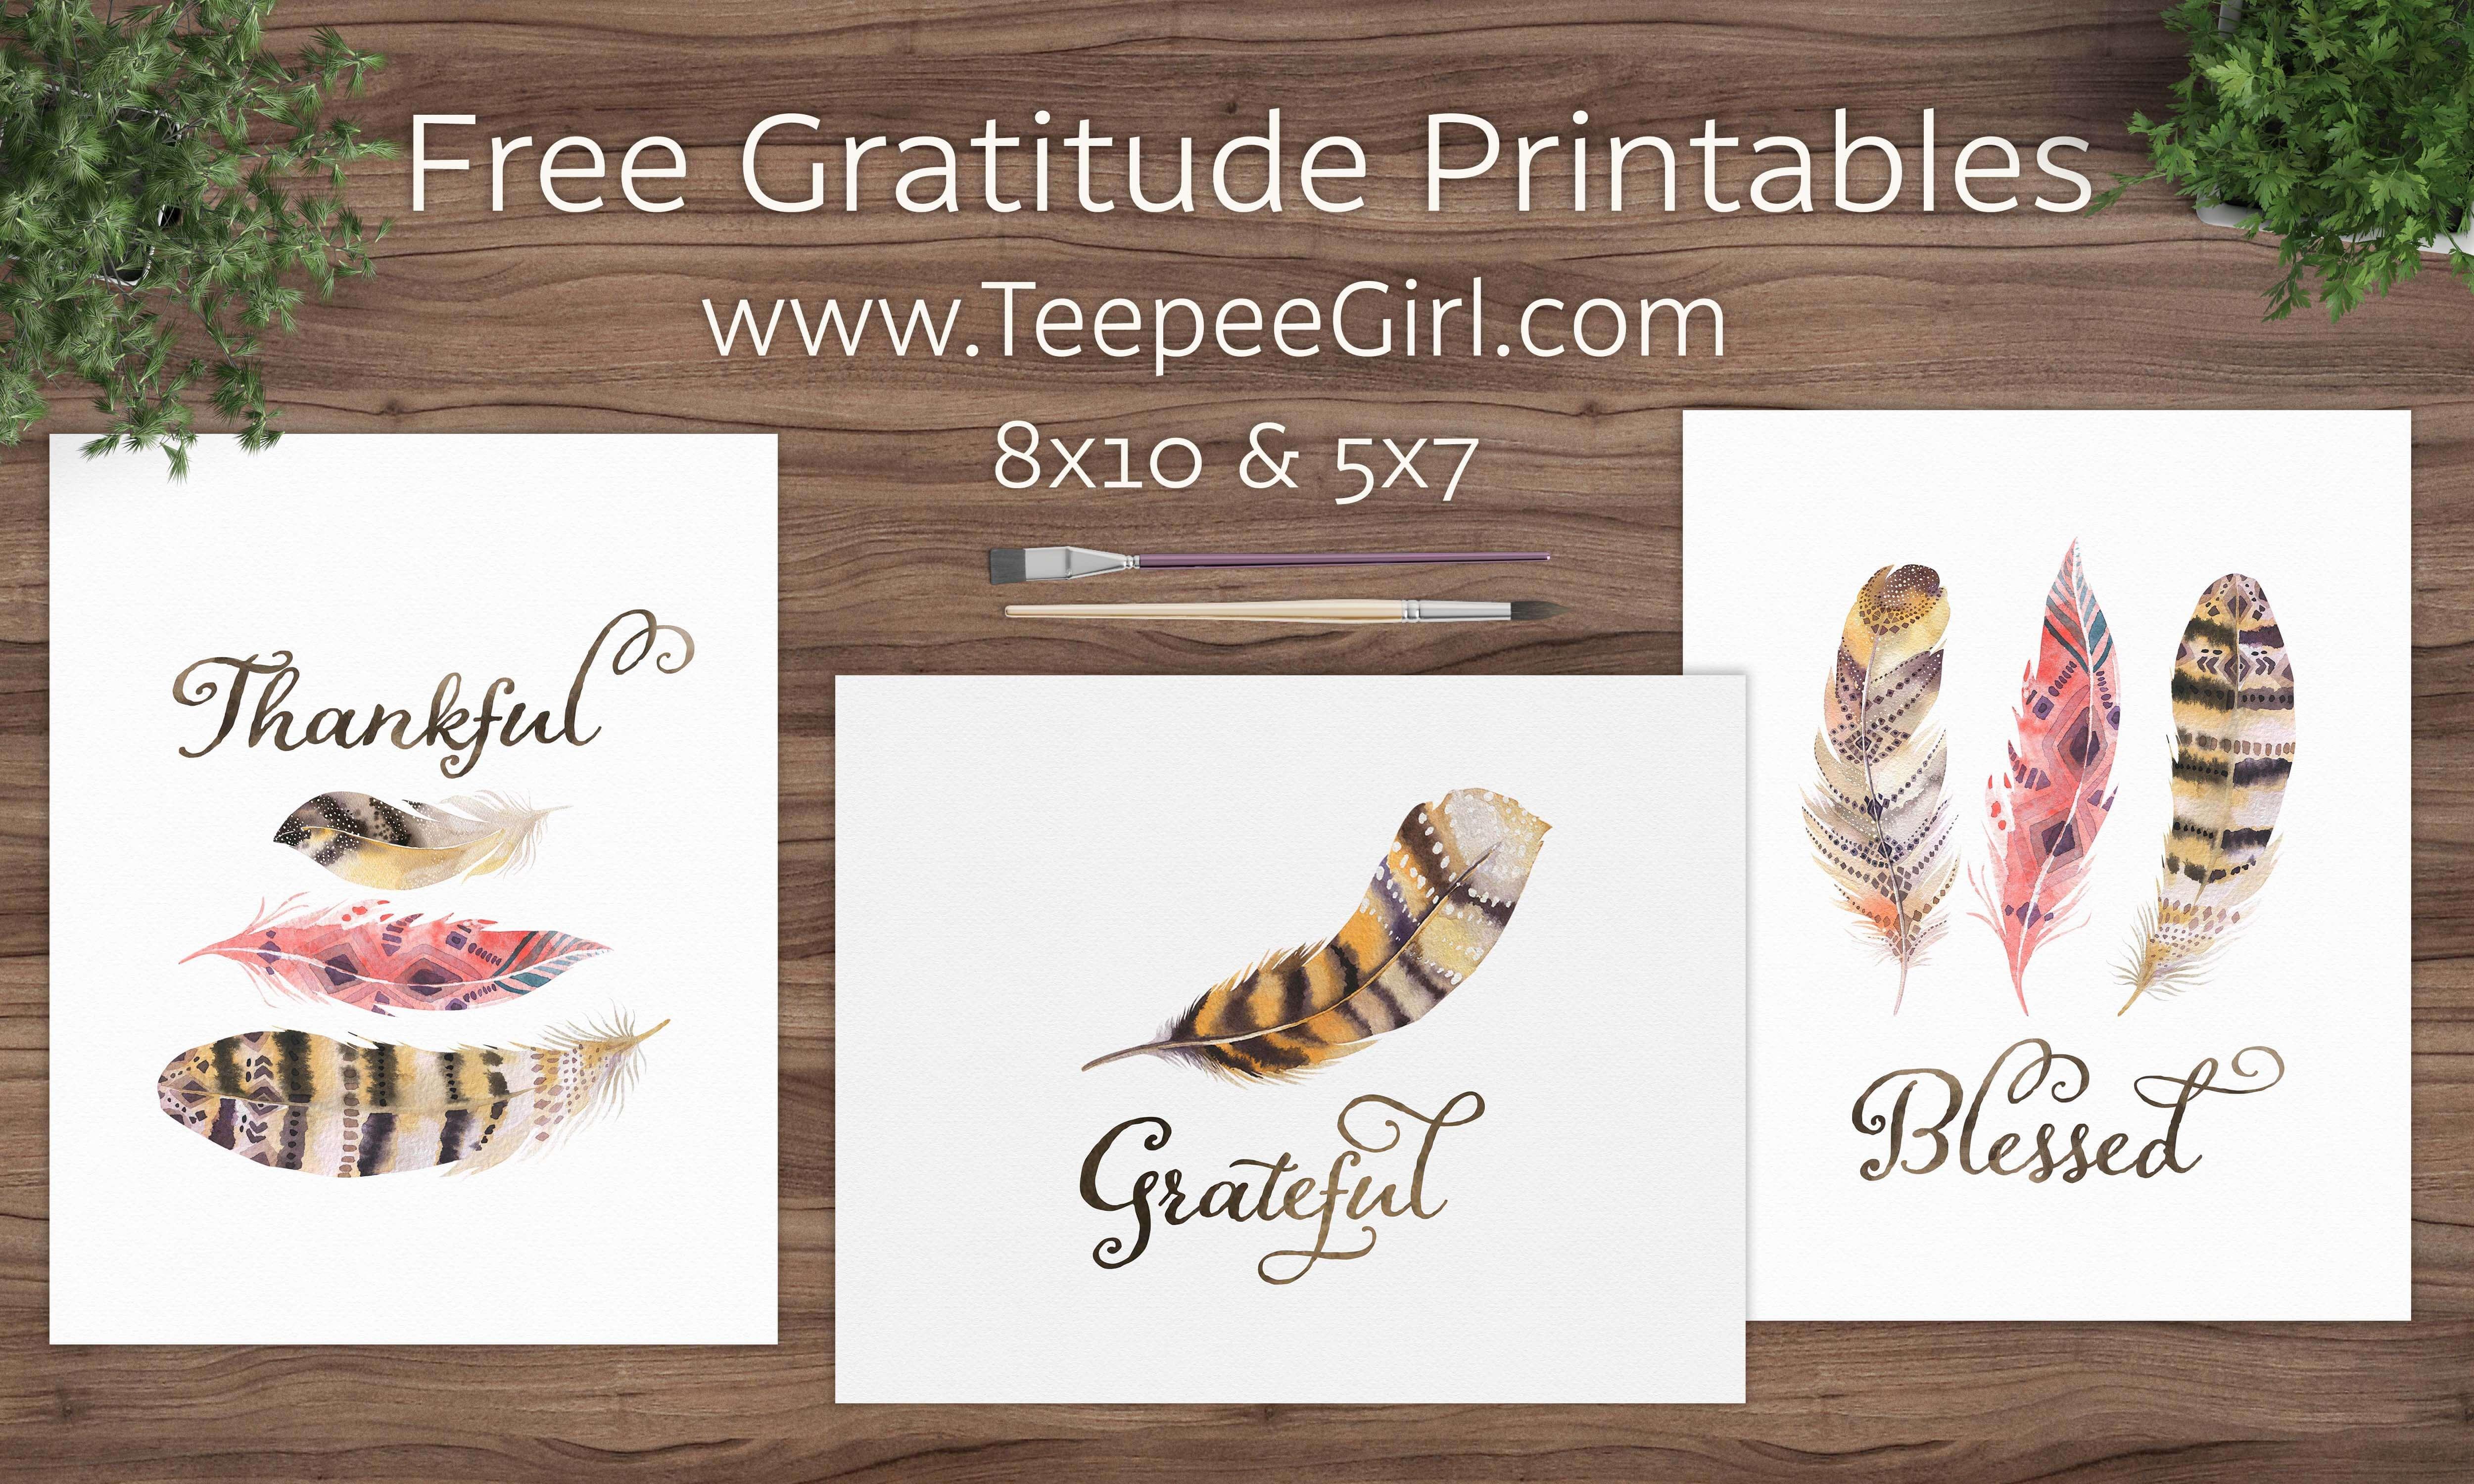 Free Gratitude Printables